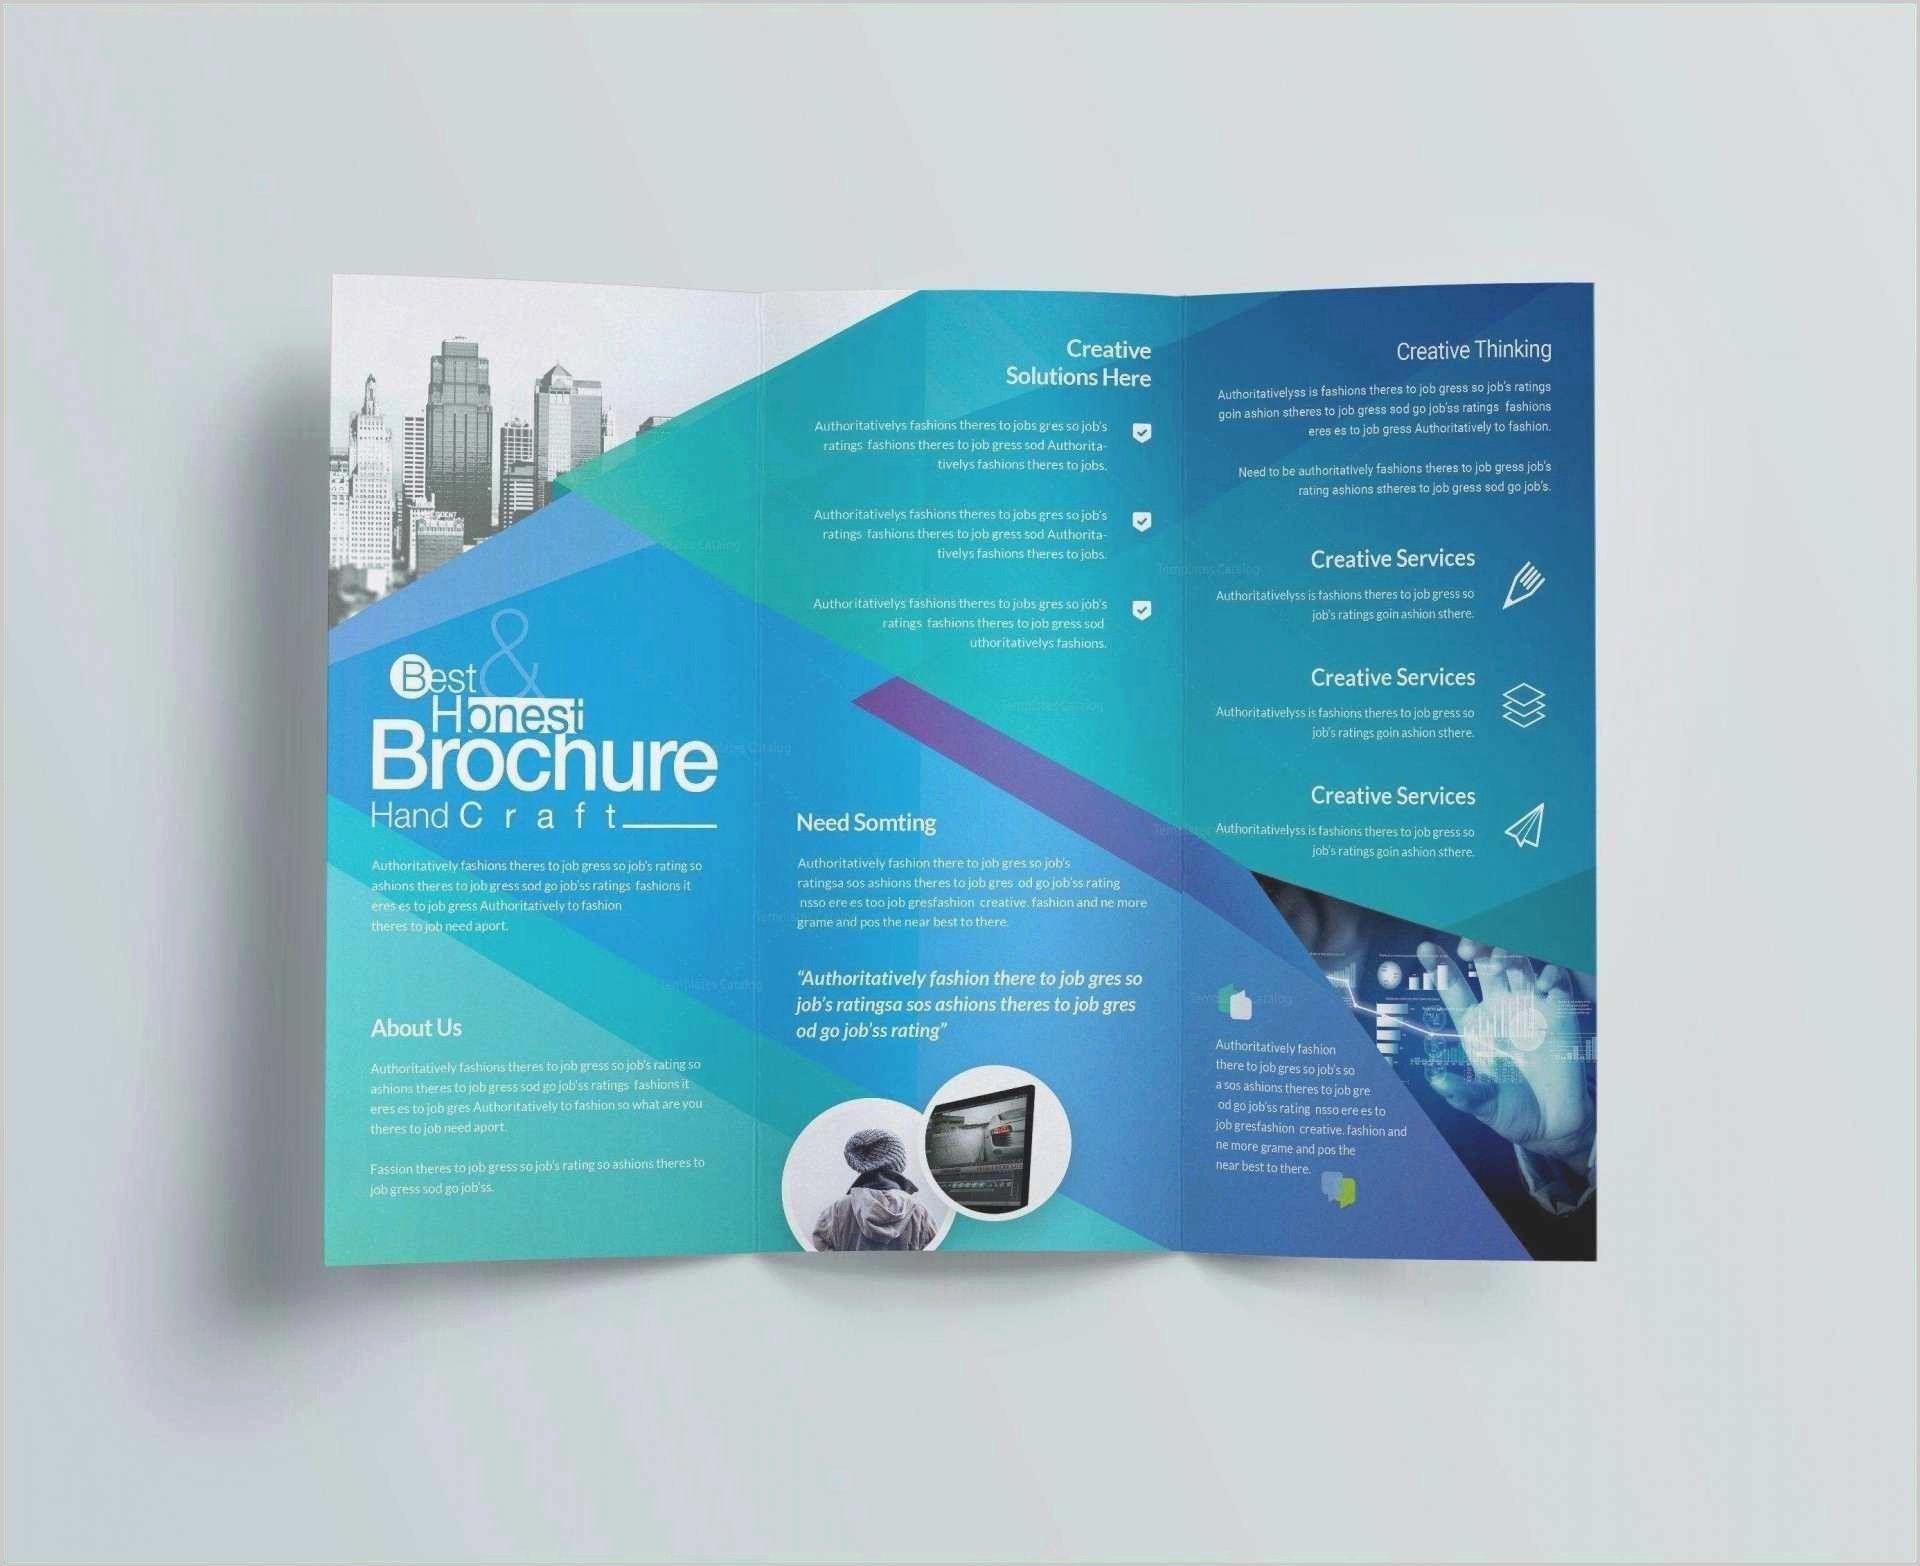 005 Impressive Microsoft Publisher Newsletter Template Photo  School Free DownloadFull